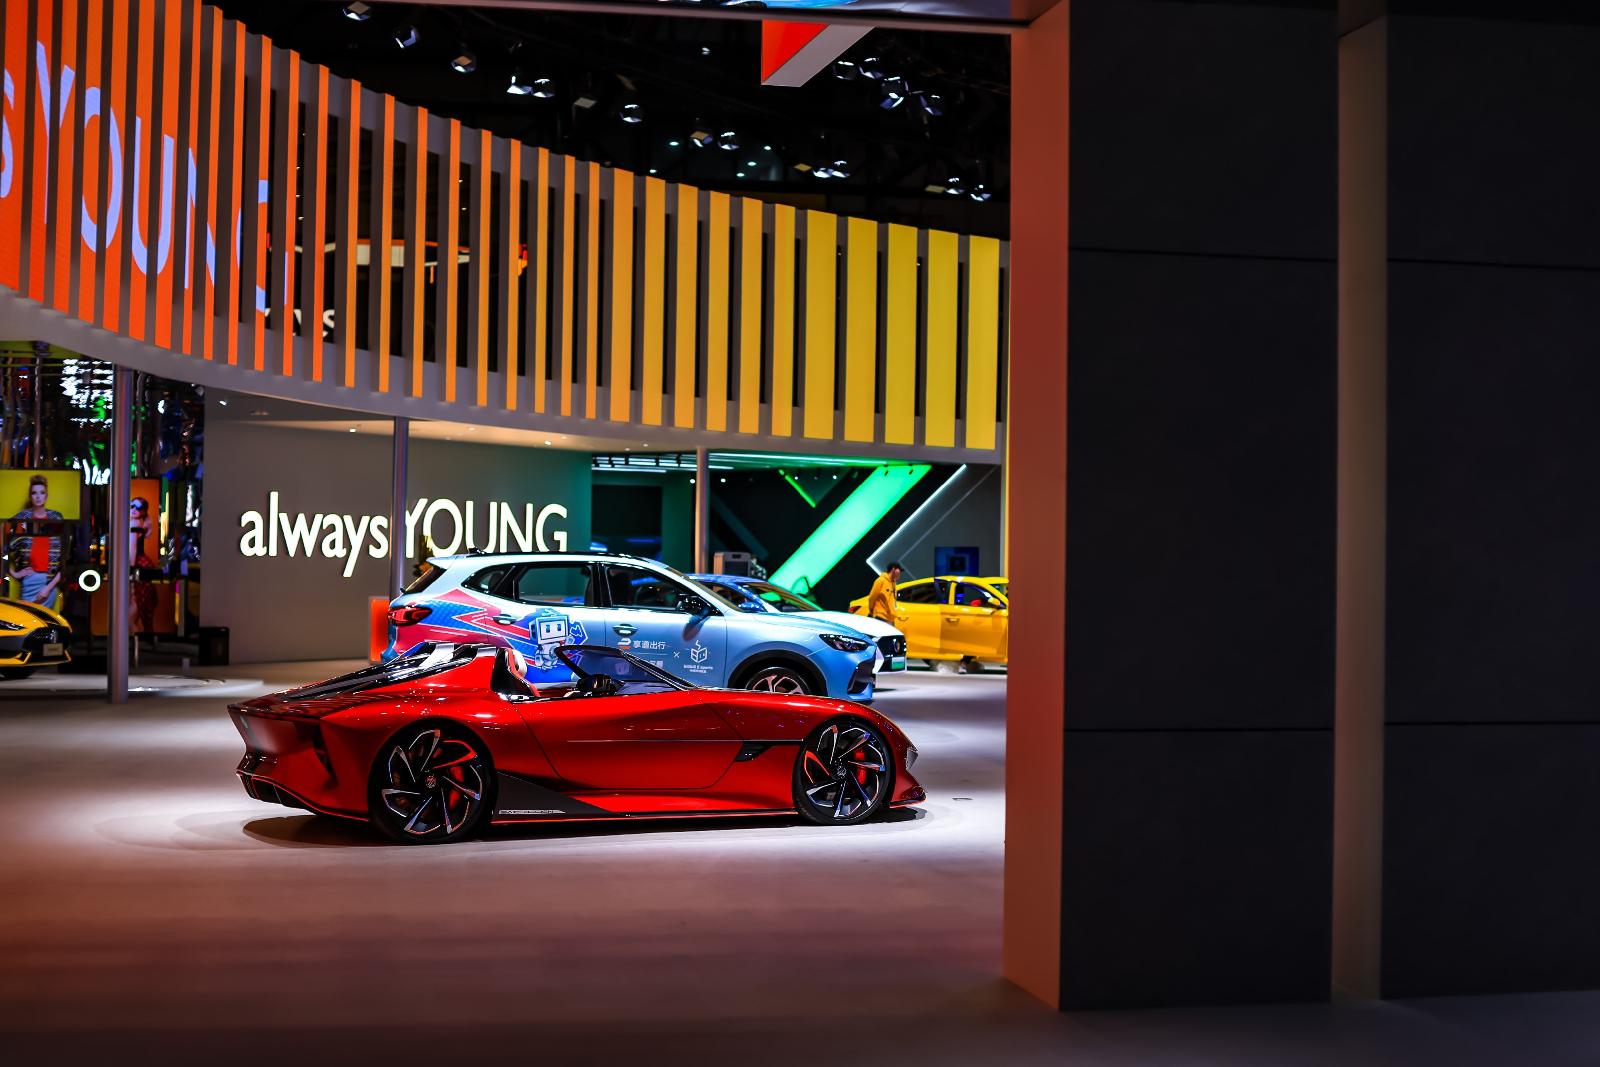 "MG เปิดตัวรถต้นแบบแห่งโลกอนาคต""MG Cyberster"" ในงาน Shanghai Auto Show 2021"